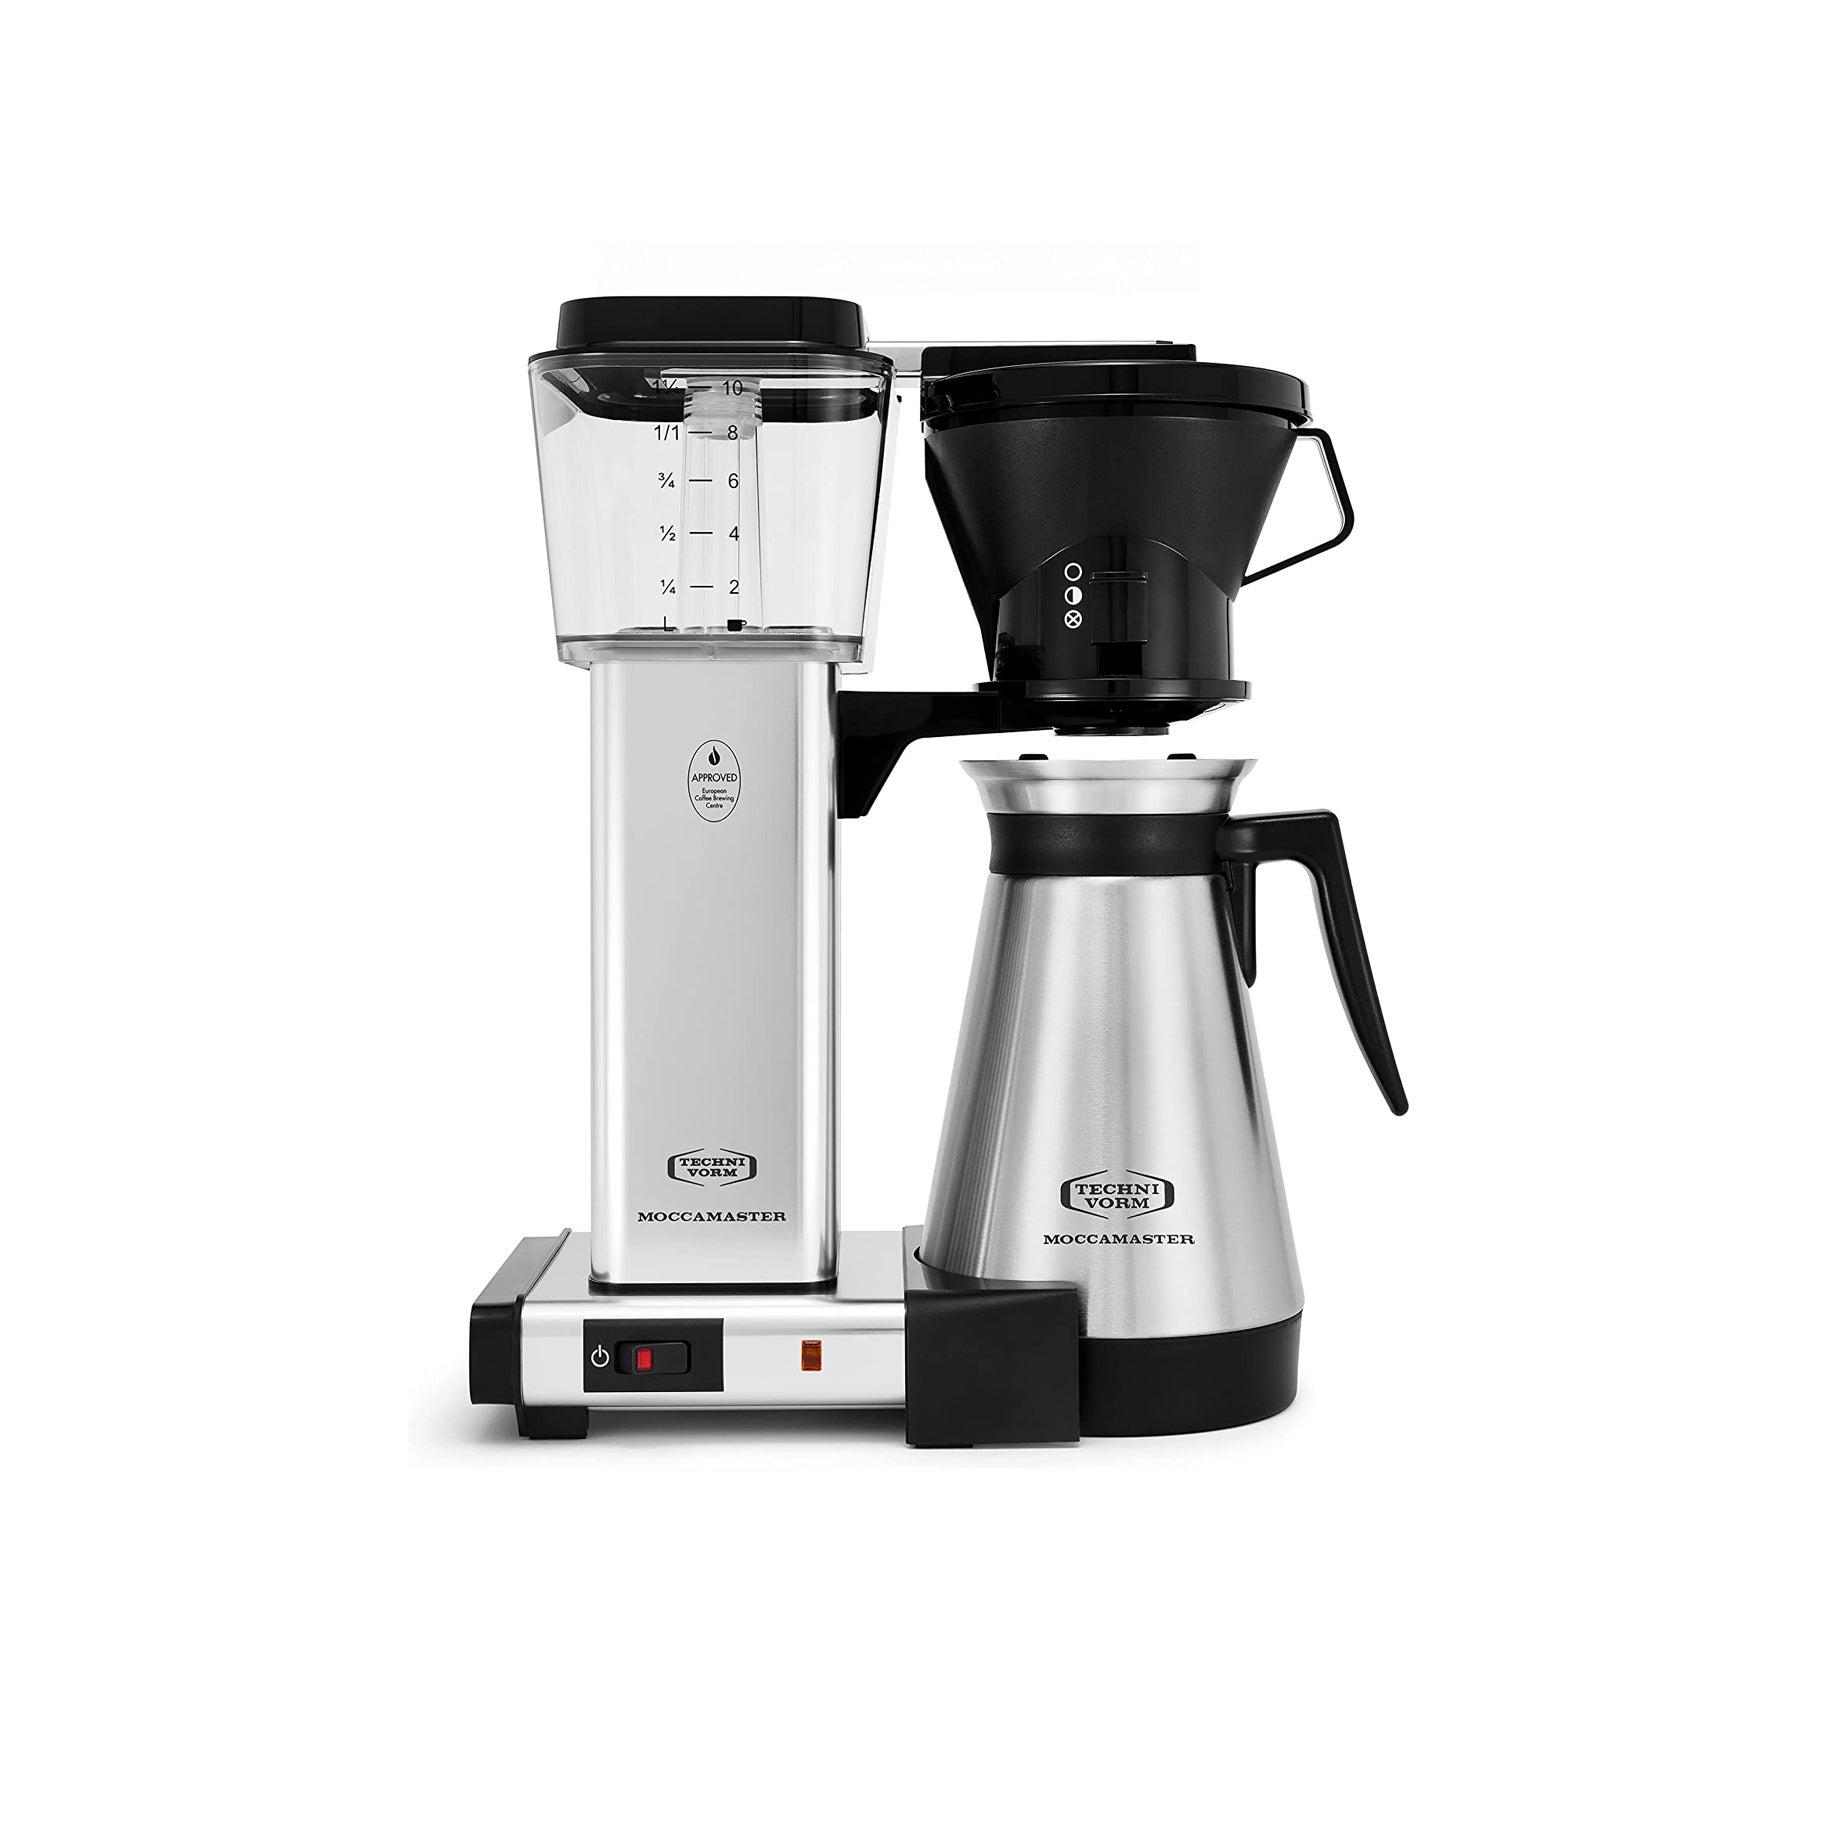 The Best Coffee Maker Option: Technivorm Moccamaster KBT